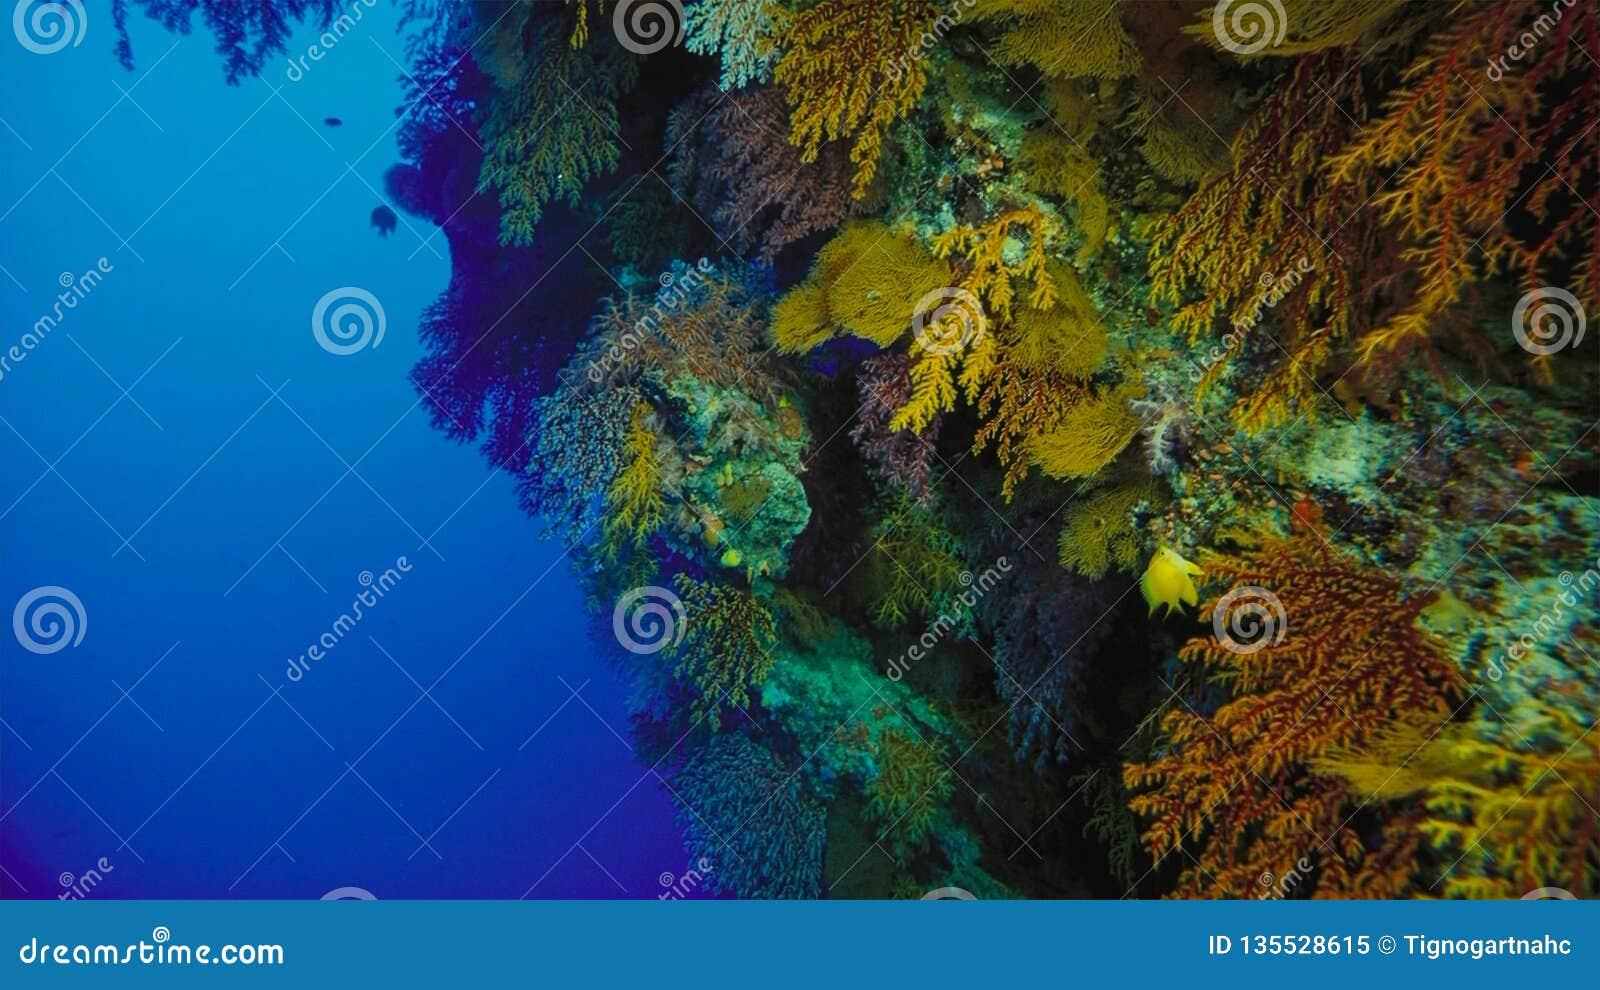 Coral reef, Great barrier reef, Australia. Underwater landscape